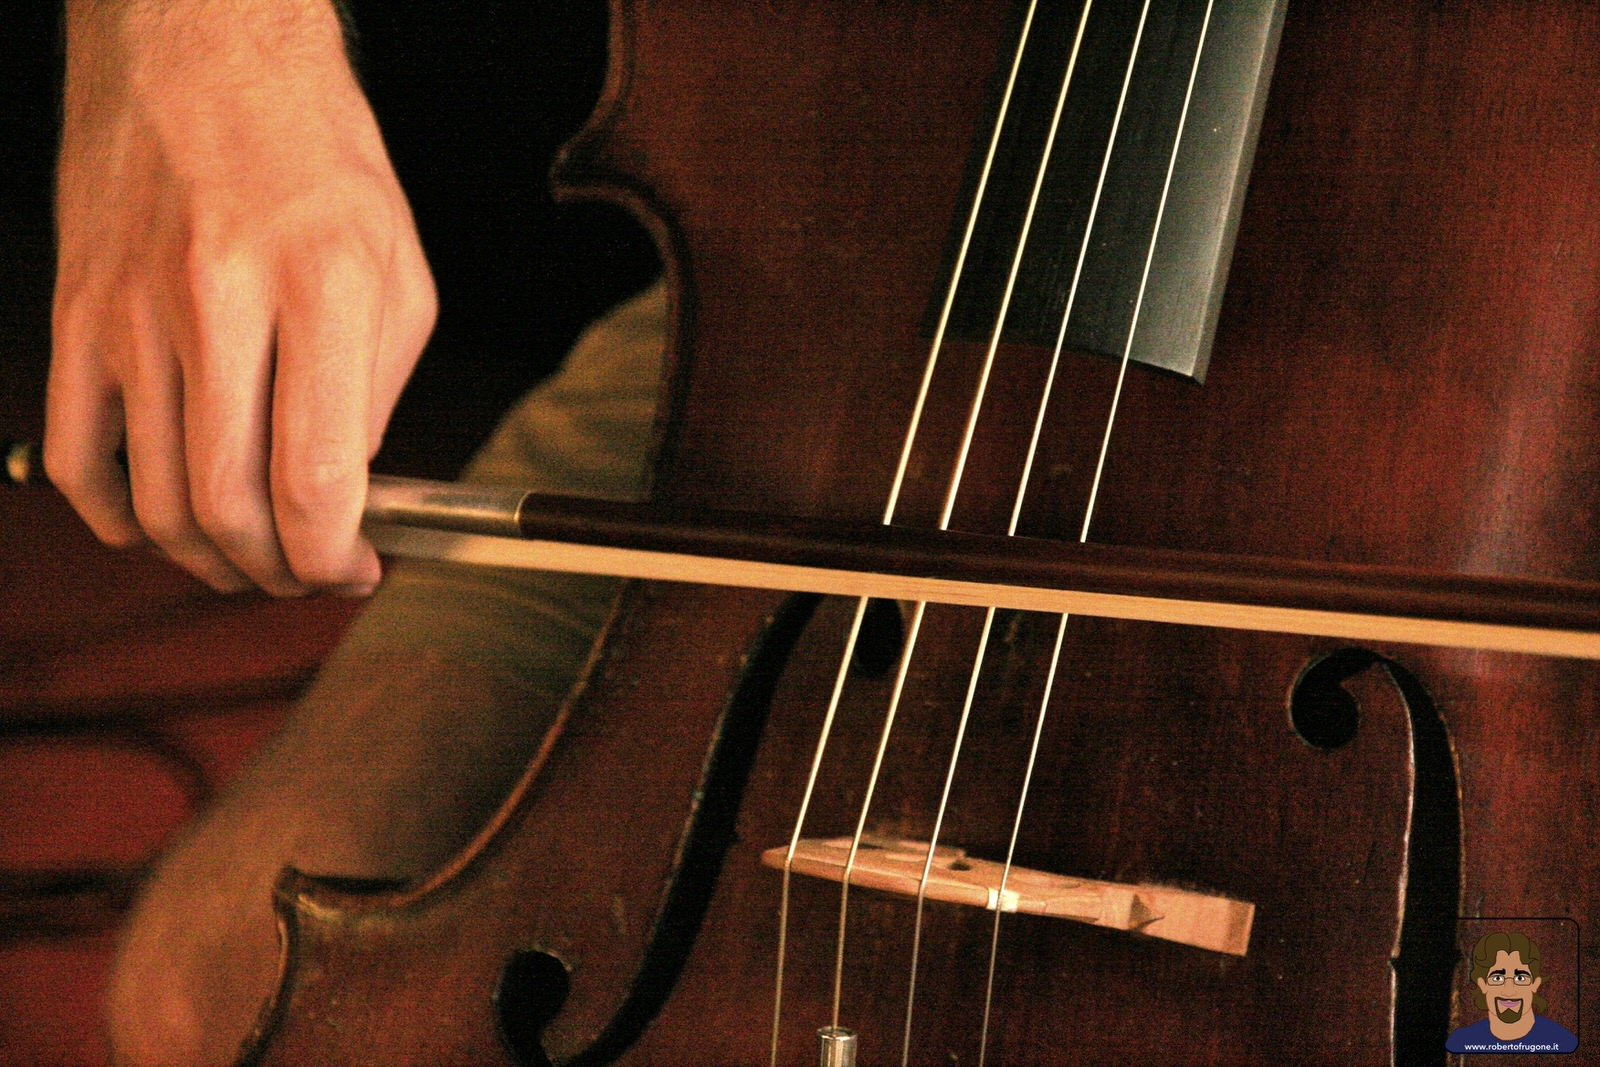 Totem Studio Sala Prove Musicali Casarza Ligure violoncello – foto Lamberto Salvan